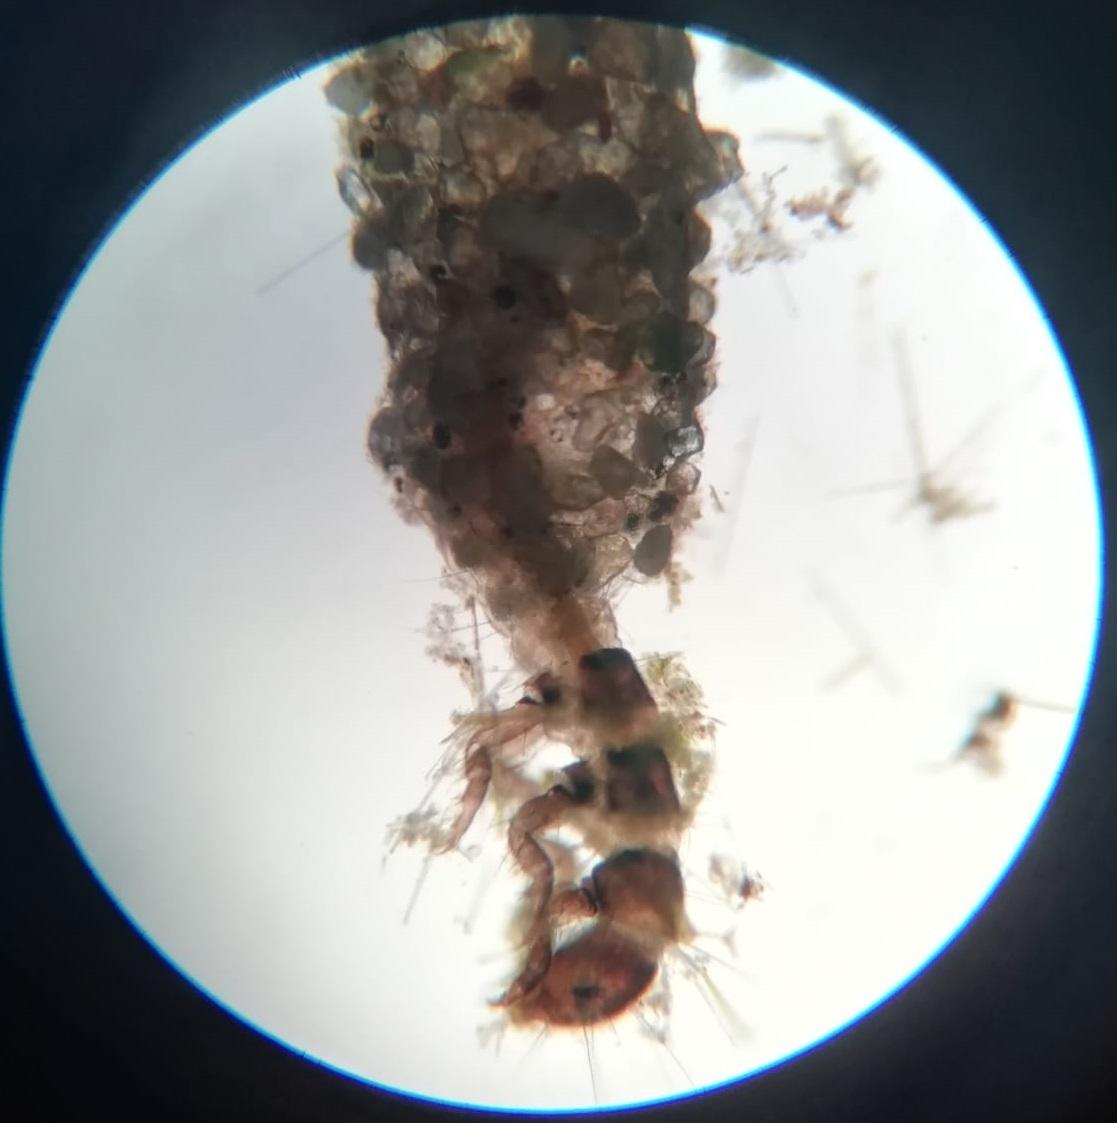 TRICOPTERO (Hydroptila)-AntLG-L-03-03.SGM